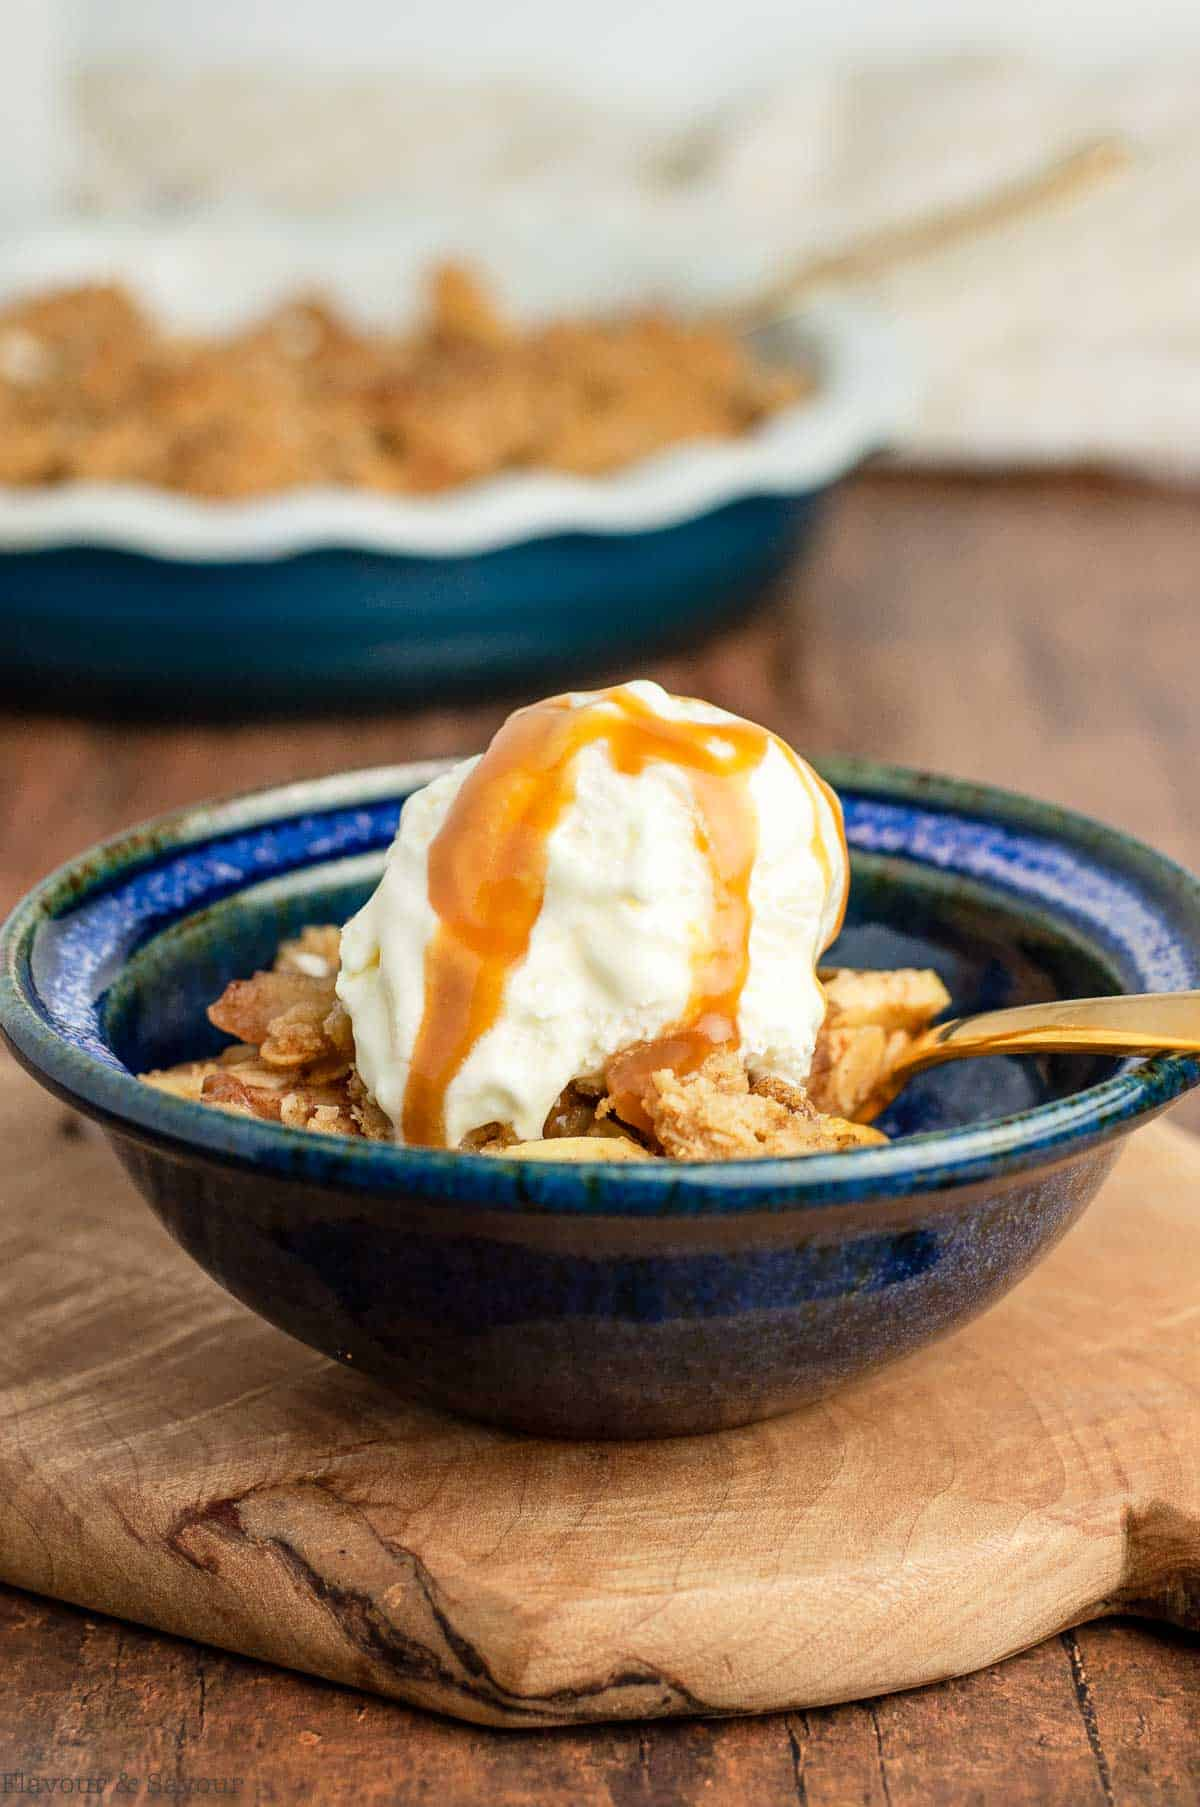 Apple crisp with ice cream and caramel sauce